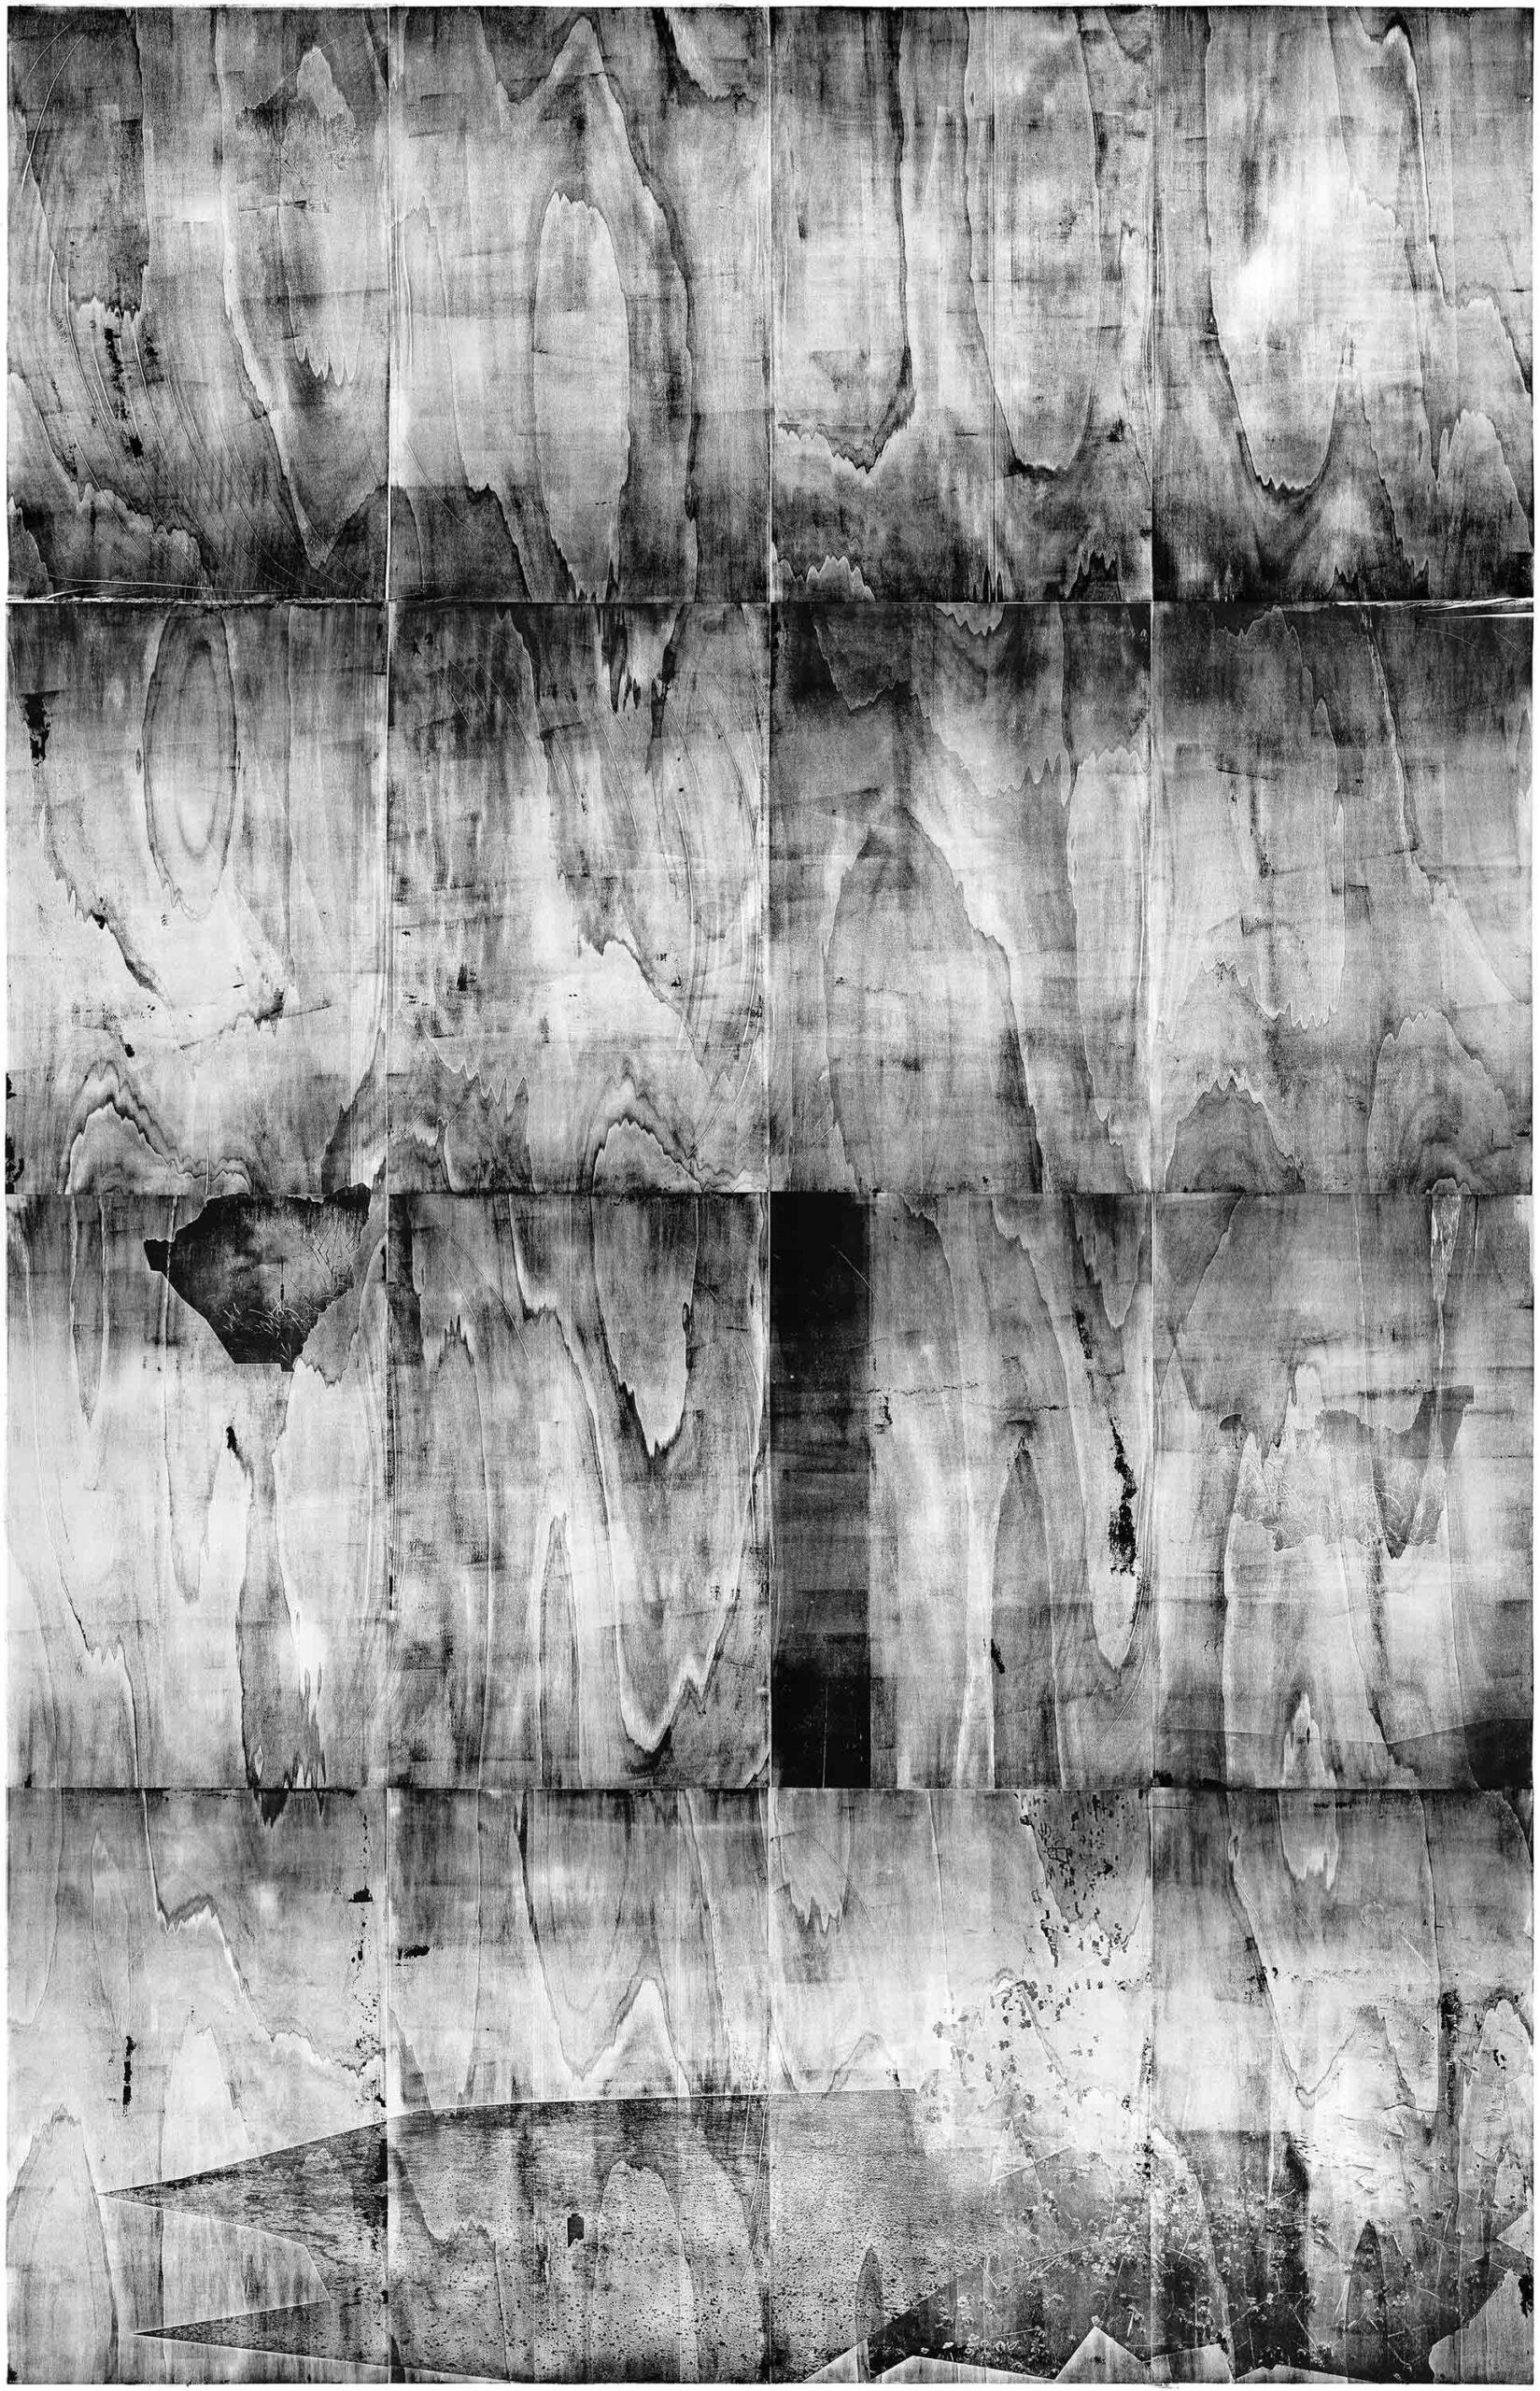 Swim in the water and see the sky, 2020, wood engraving, 393,2 x 260,1 cm, Genaro Strobel